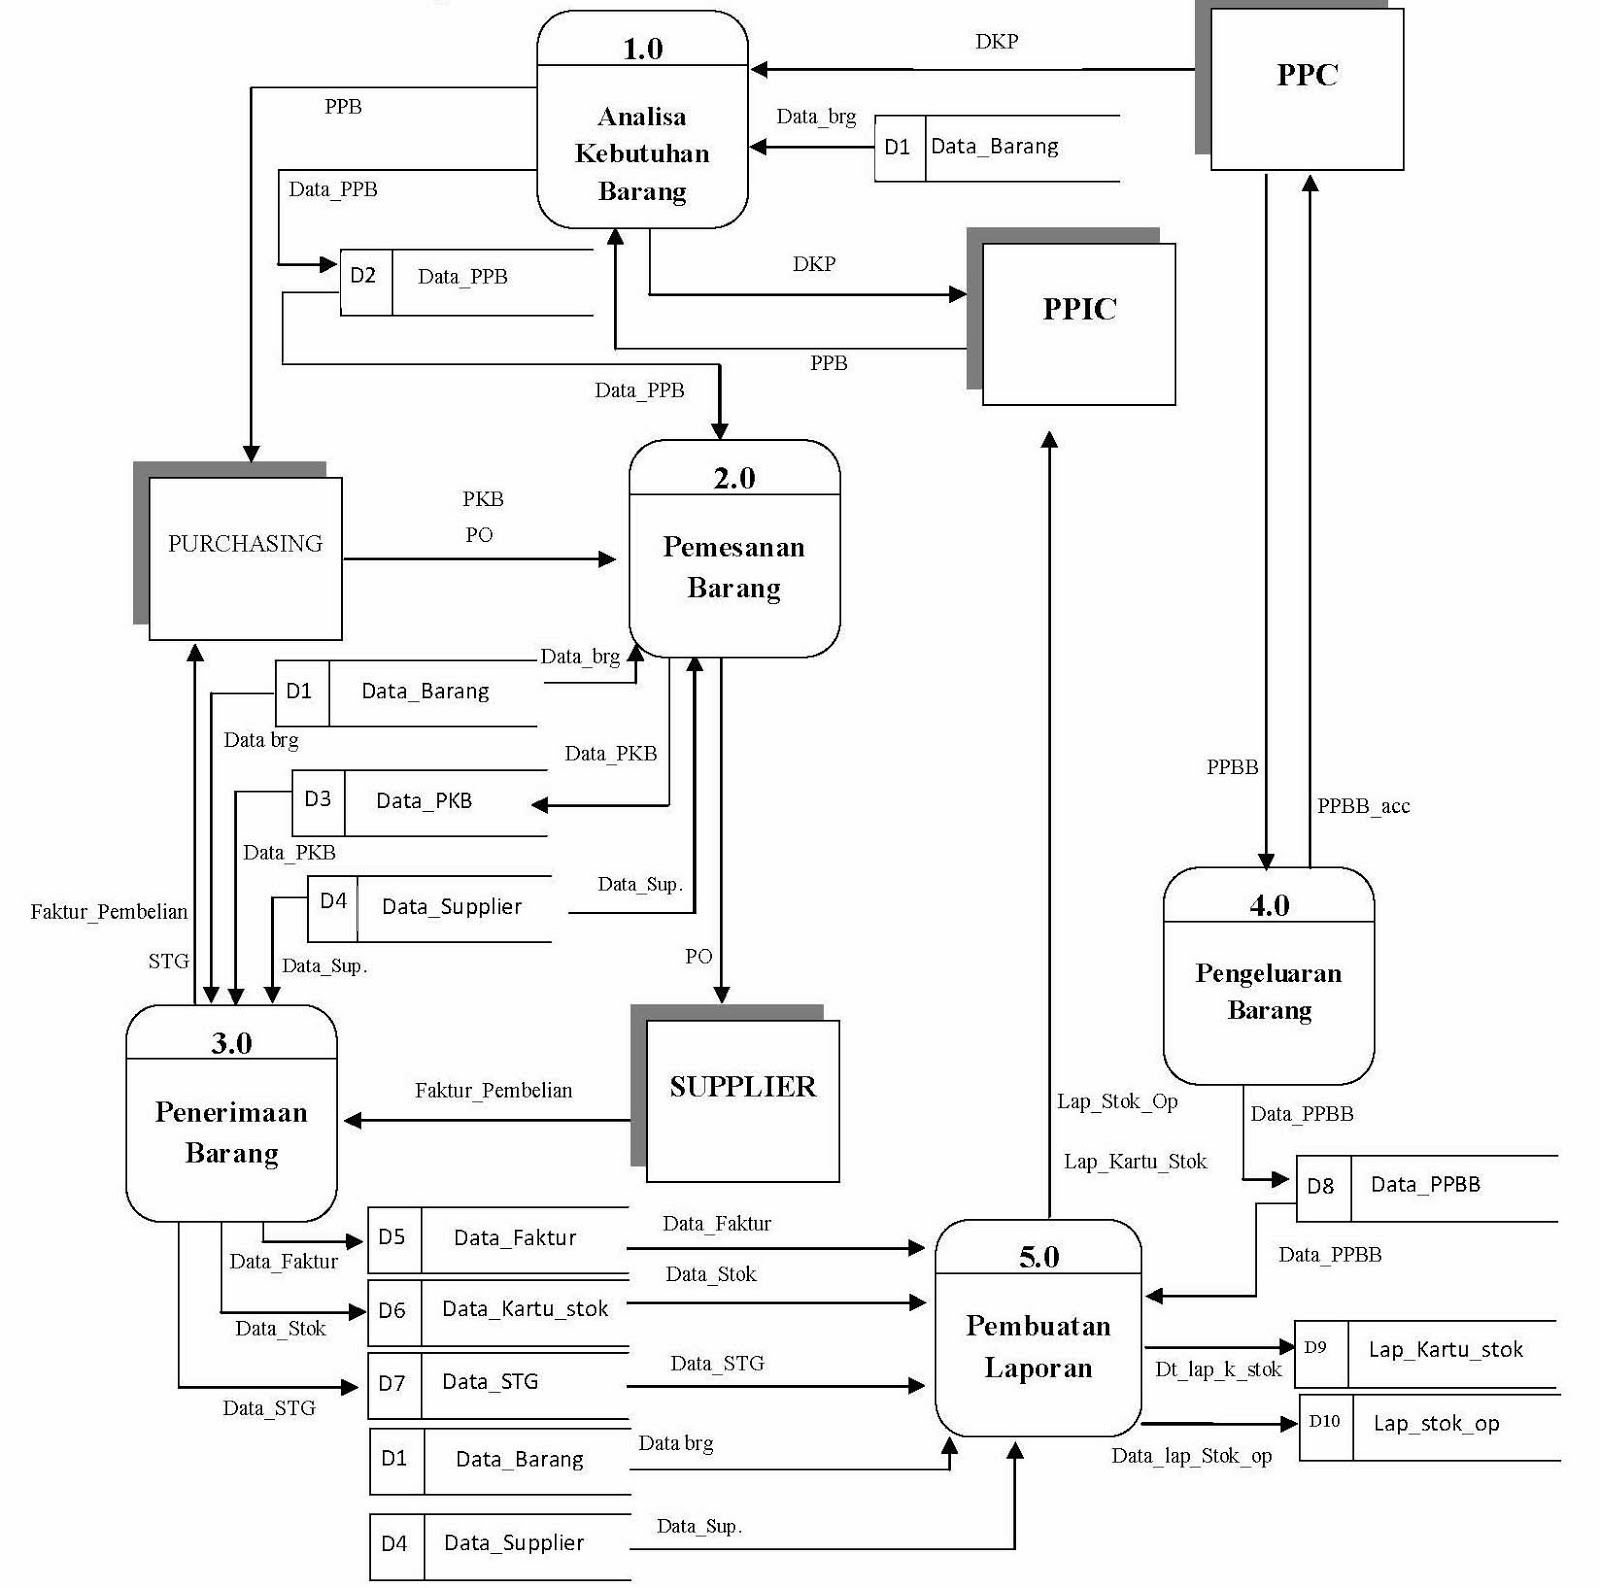 Millatys diagram nol sistem berjalan ccuart Image collections